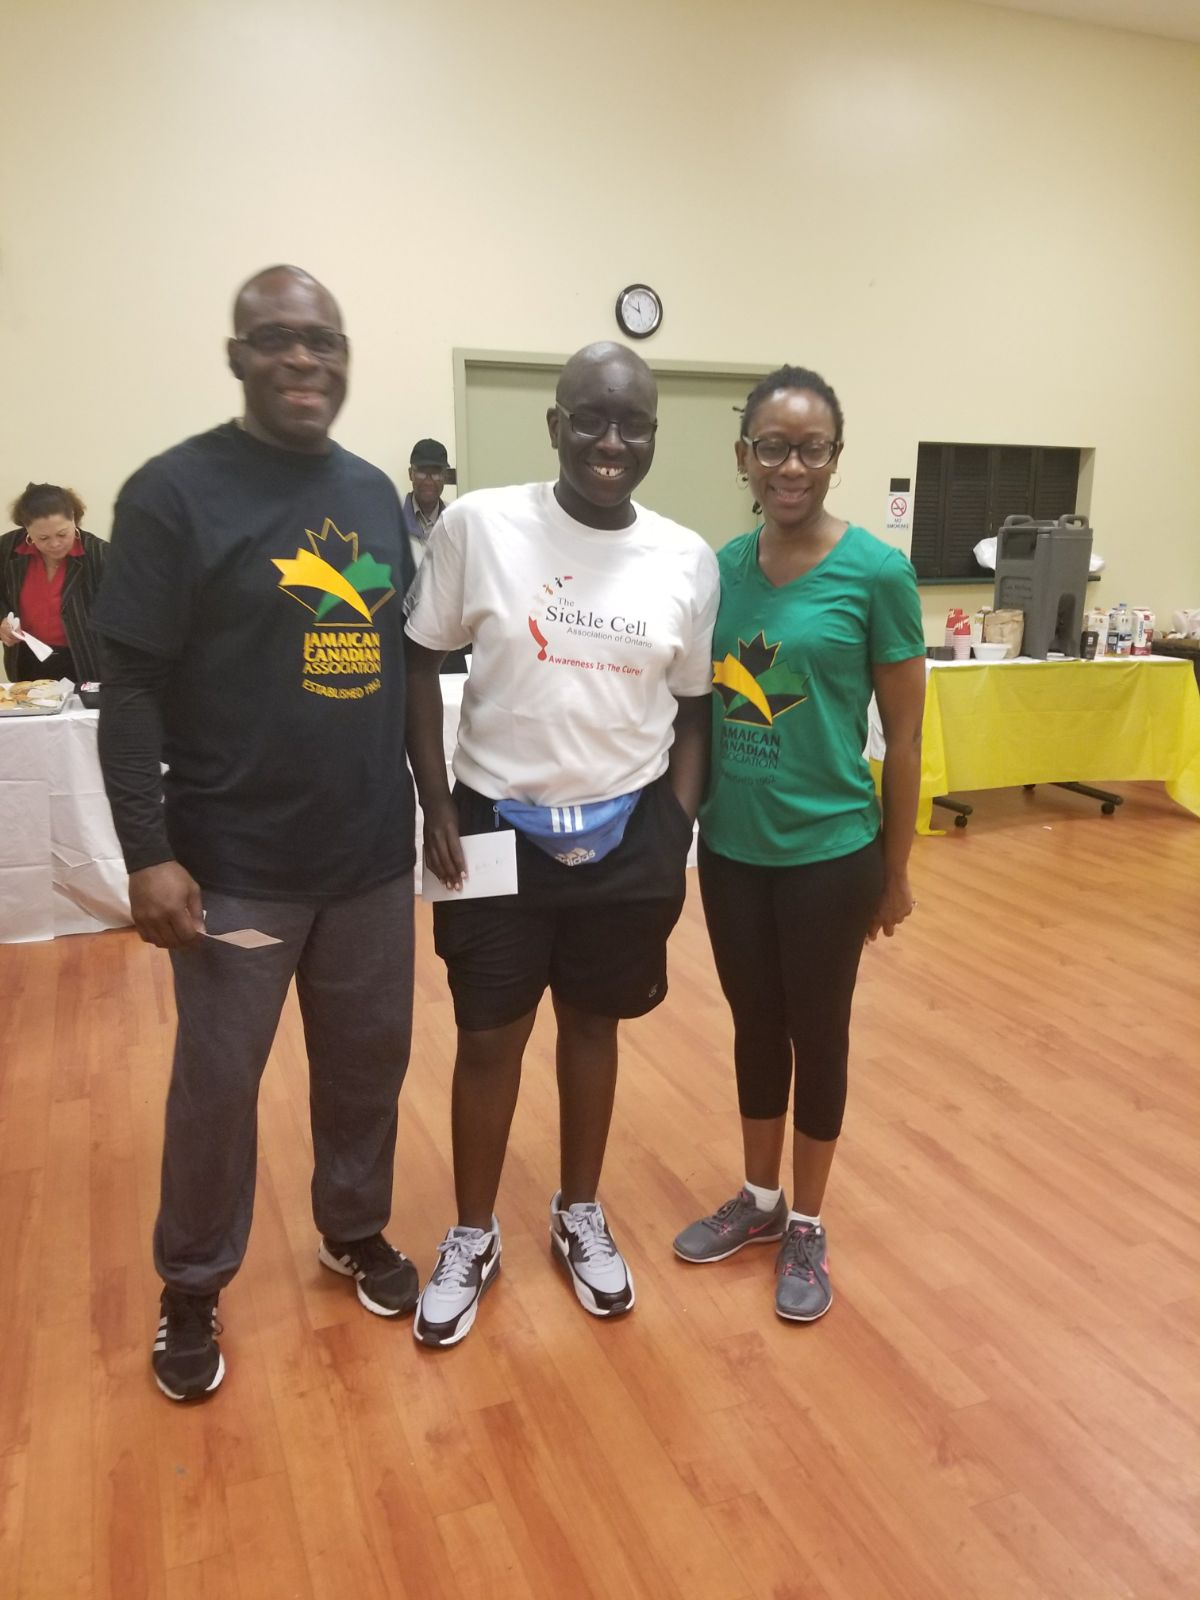 JCA Walk-a-ton first place 10K winner, Jaden Boyd with JCA President and Treasurer